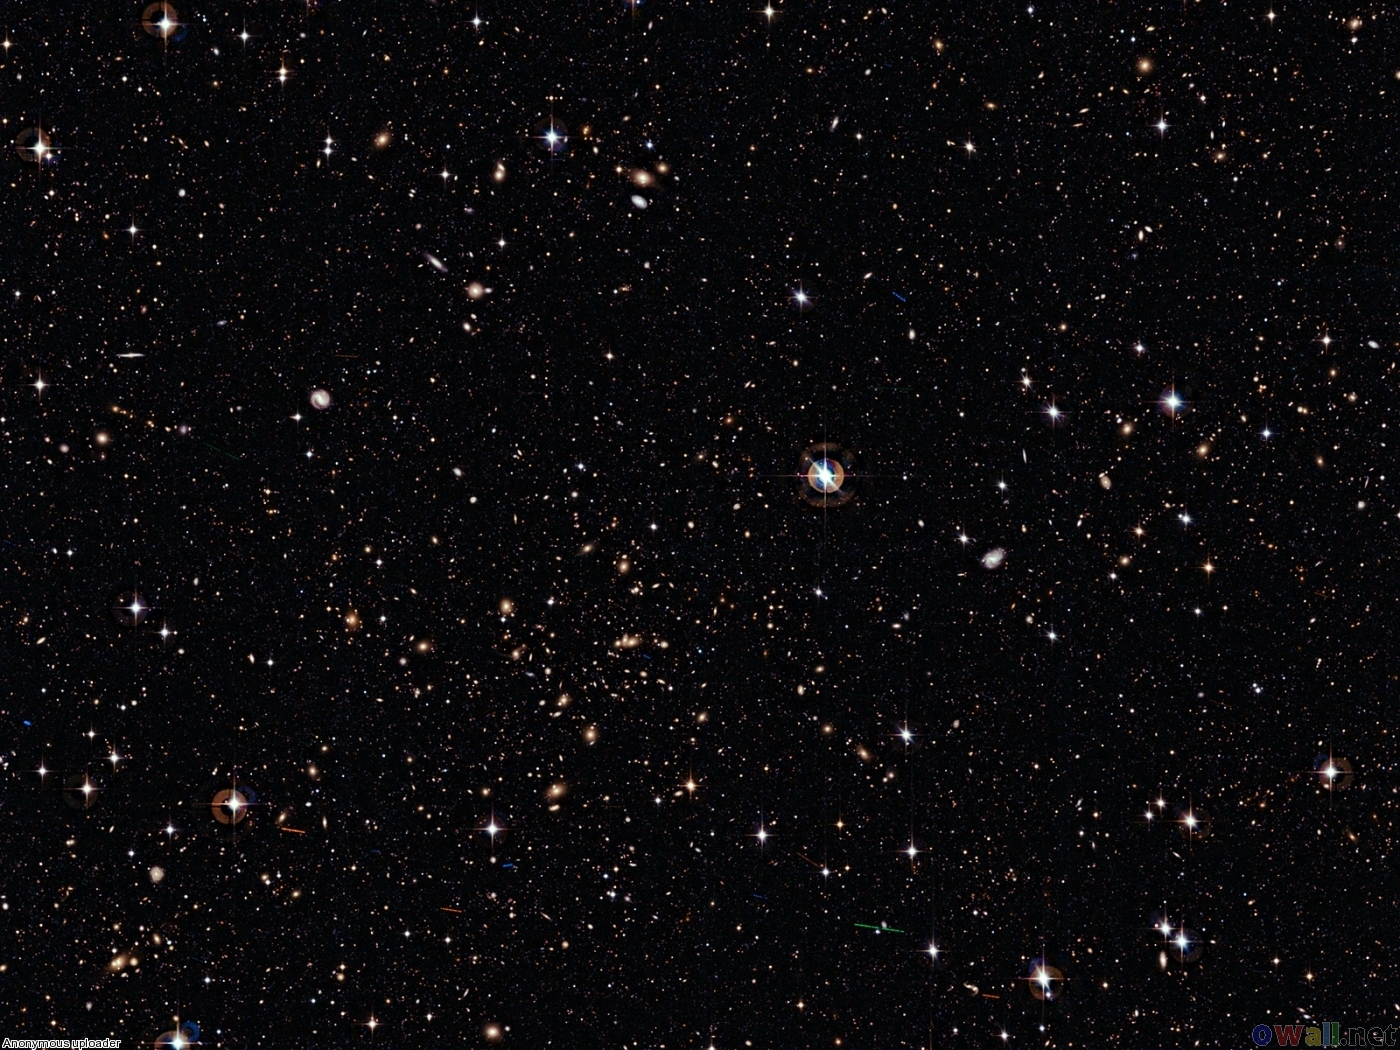 Shining stars wallpaper 17398   Open Walls 1400x1050